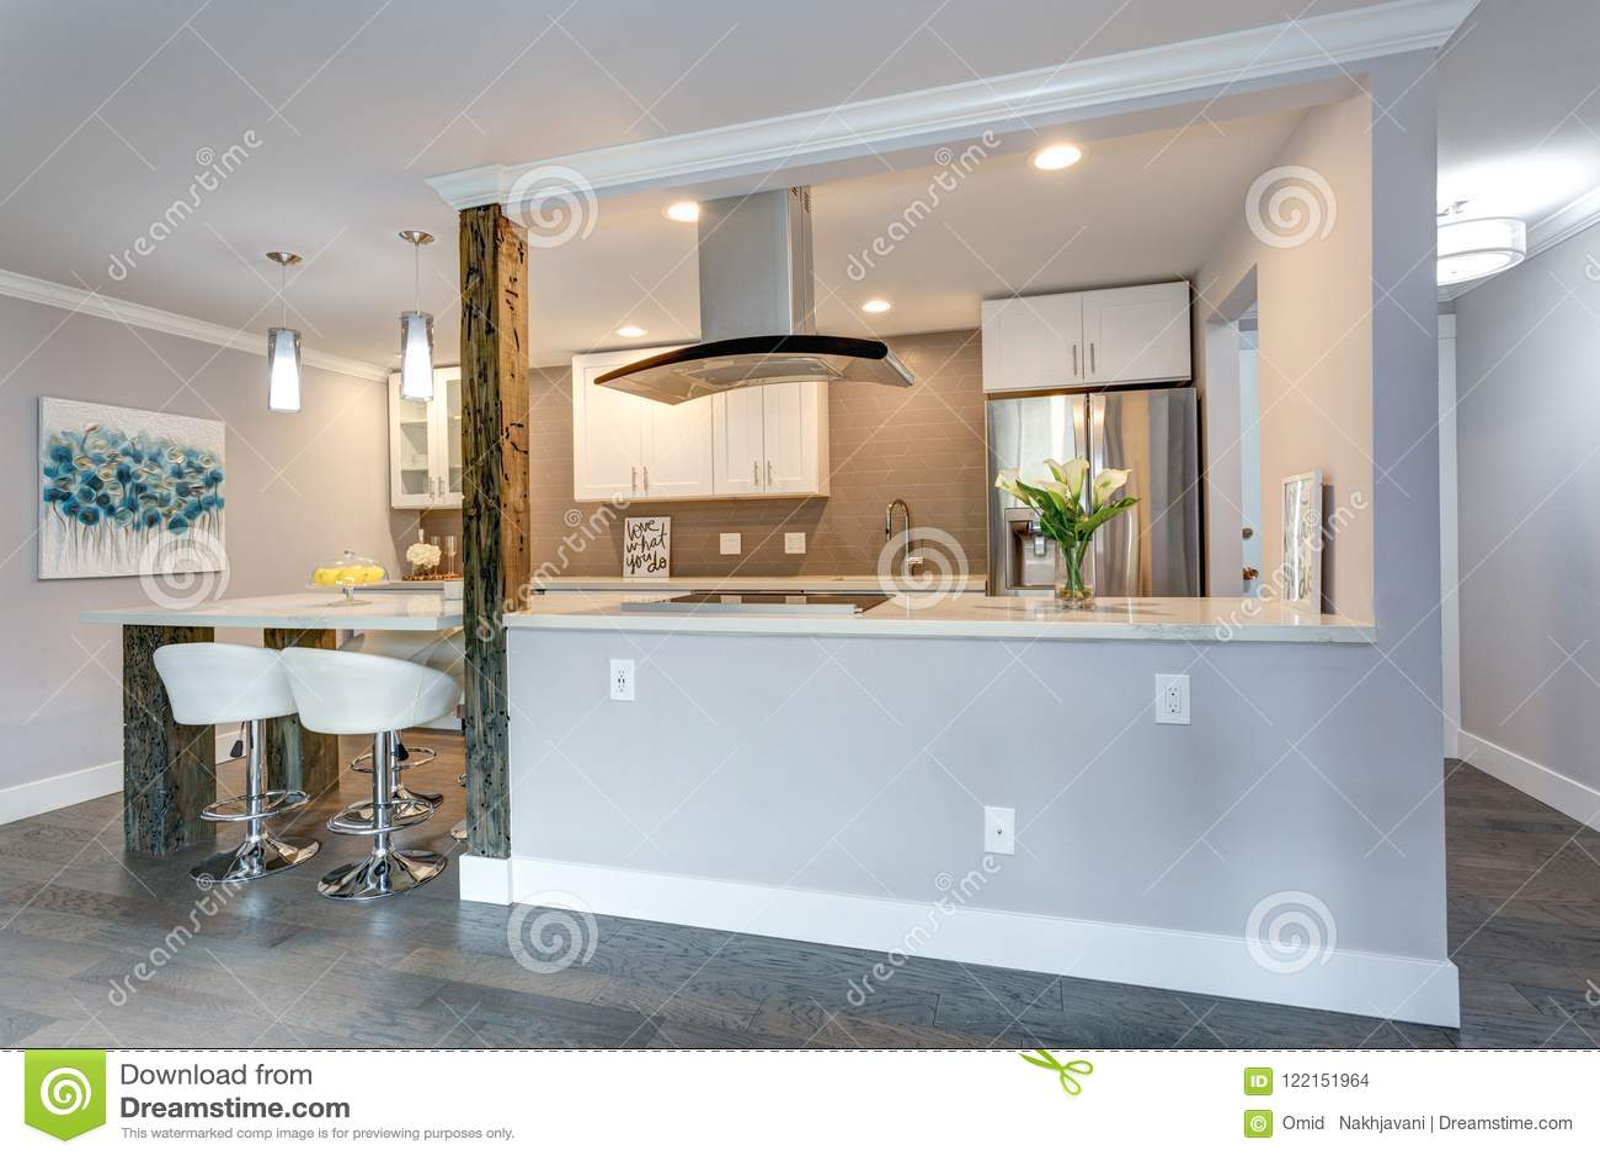 Kleine Witte Keuken : Witte keuken in u opstelling keuken keuken